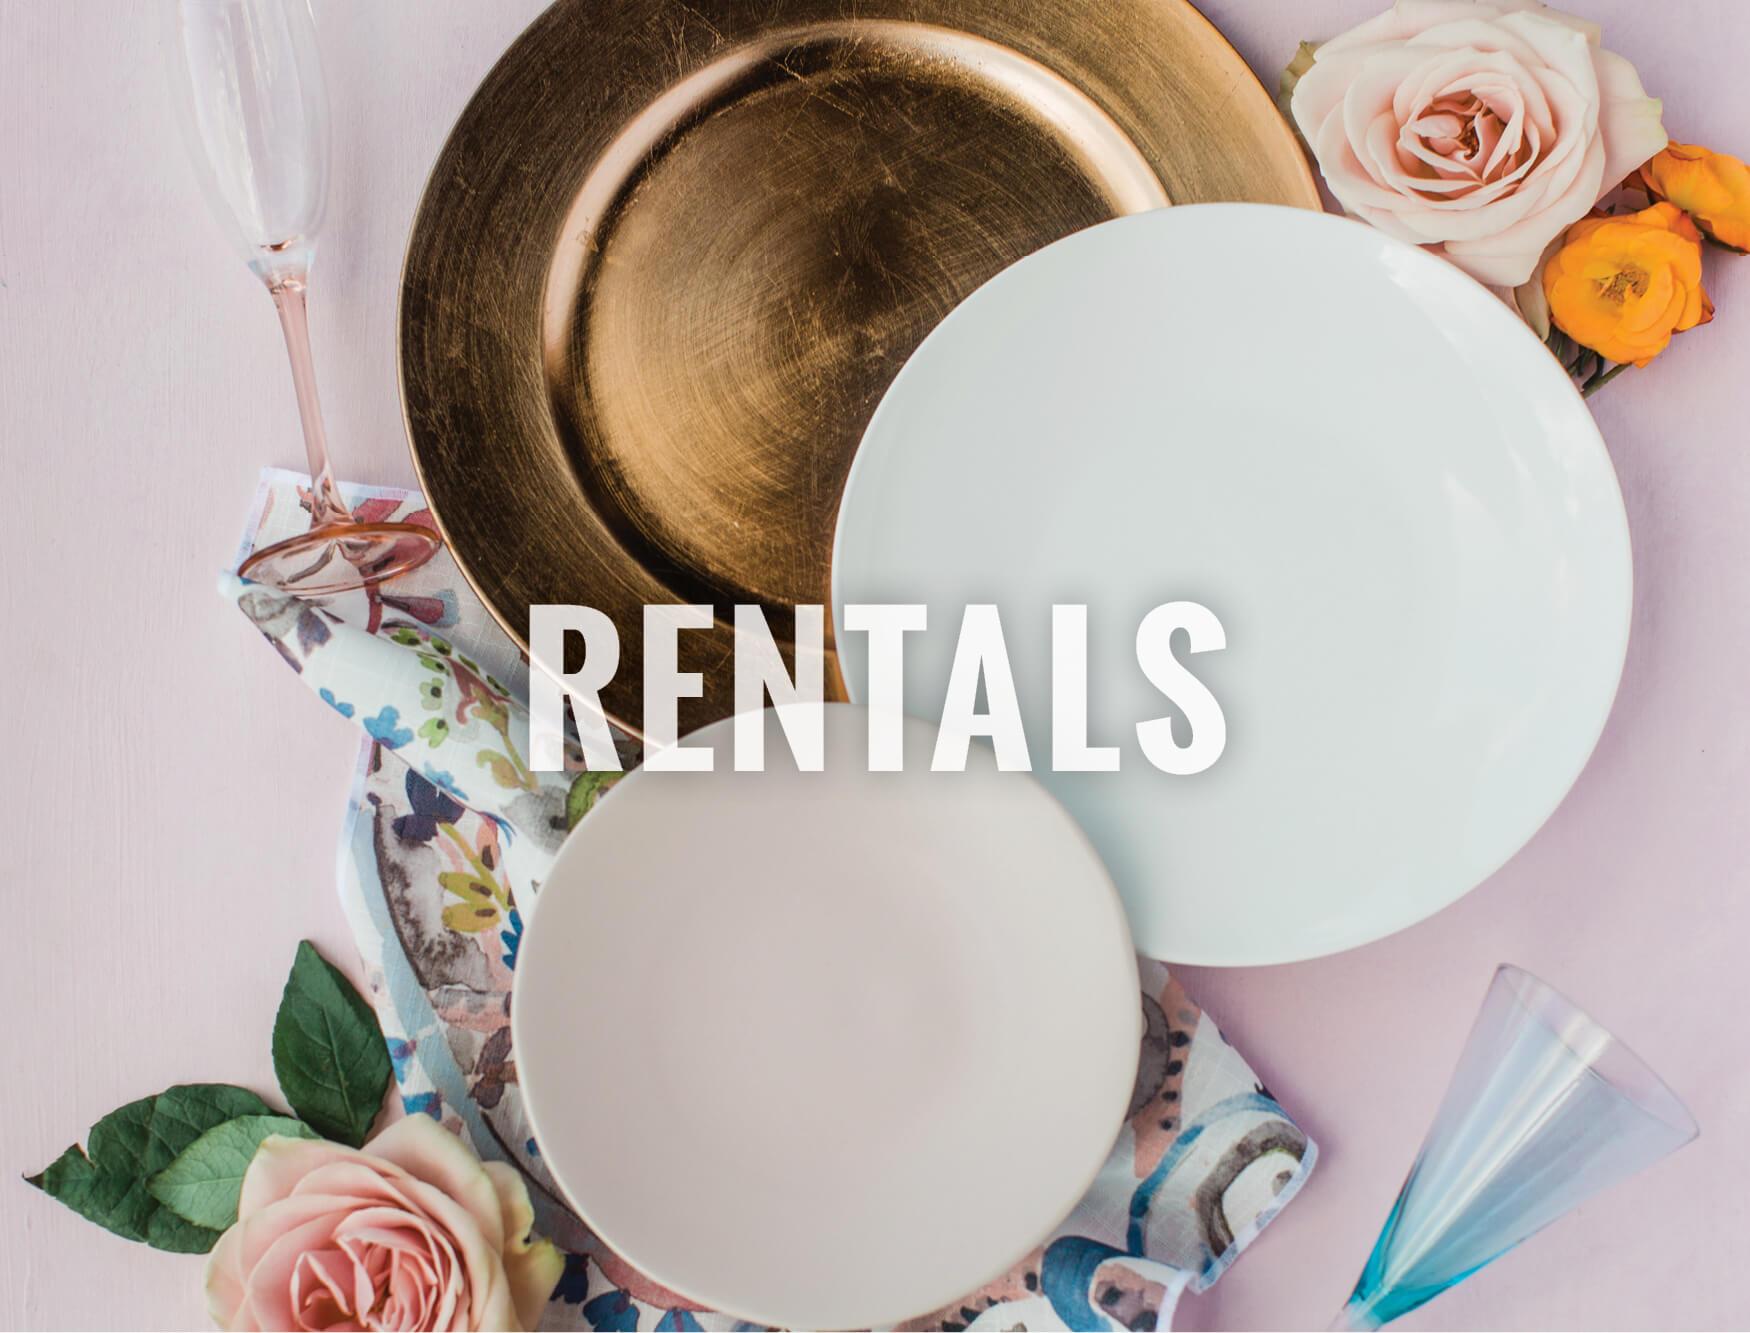 Rentals_category